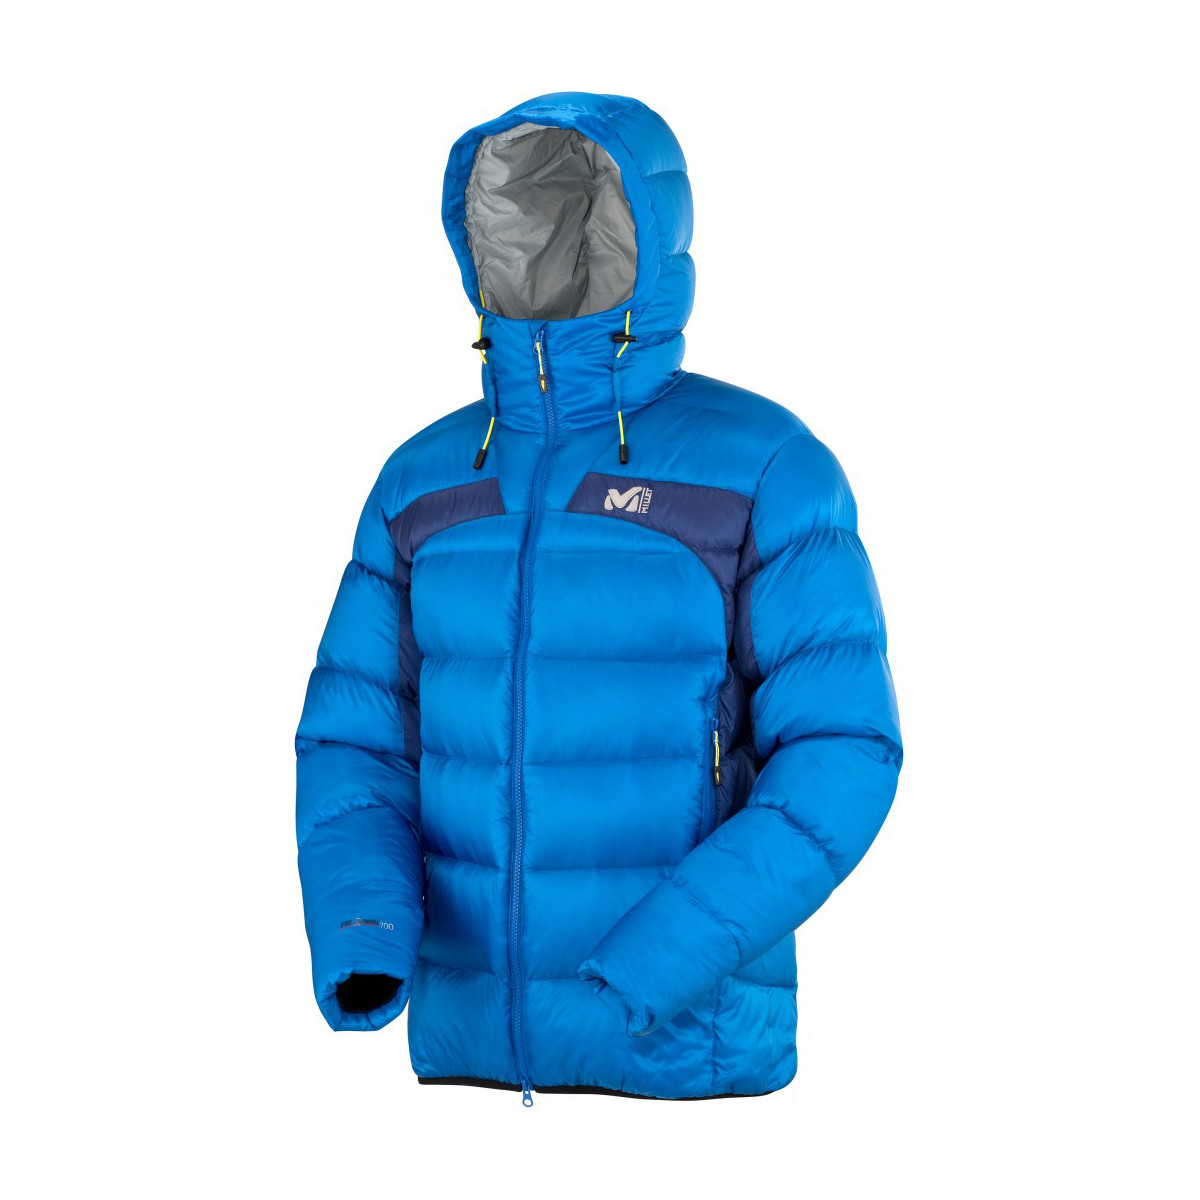 Millet Kamet Jacket